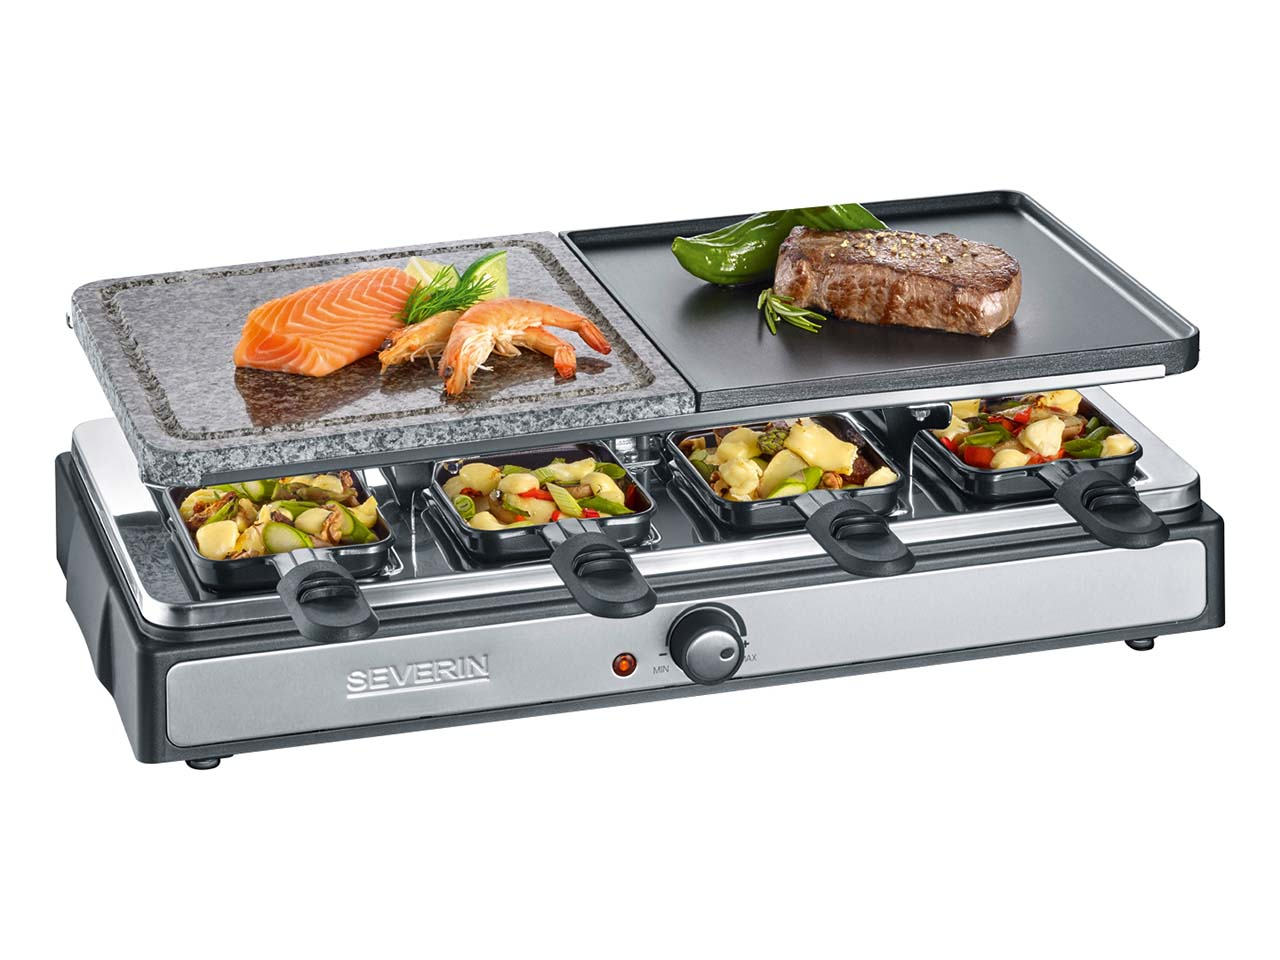 "severin raclette-grill ""rg 2344"" - öko, fair einkaufen | memolife.de"